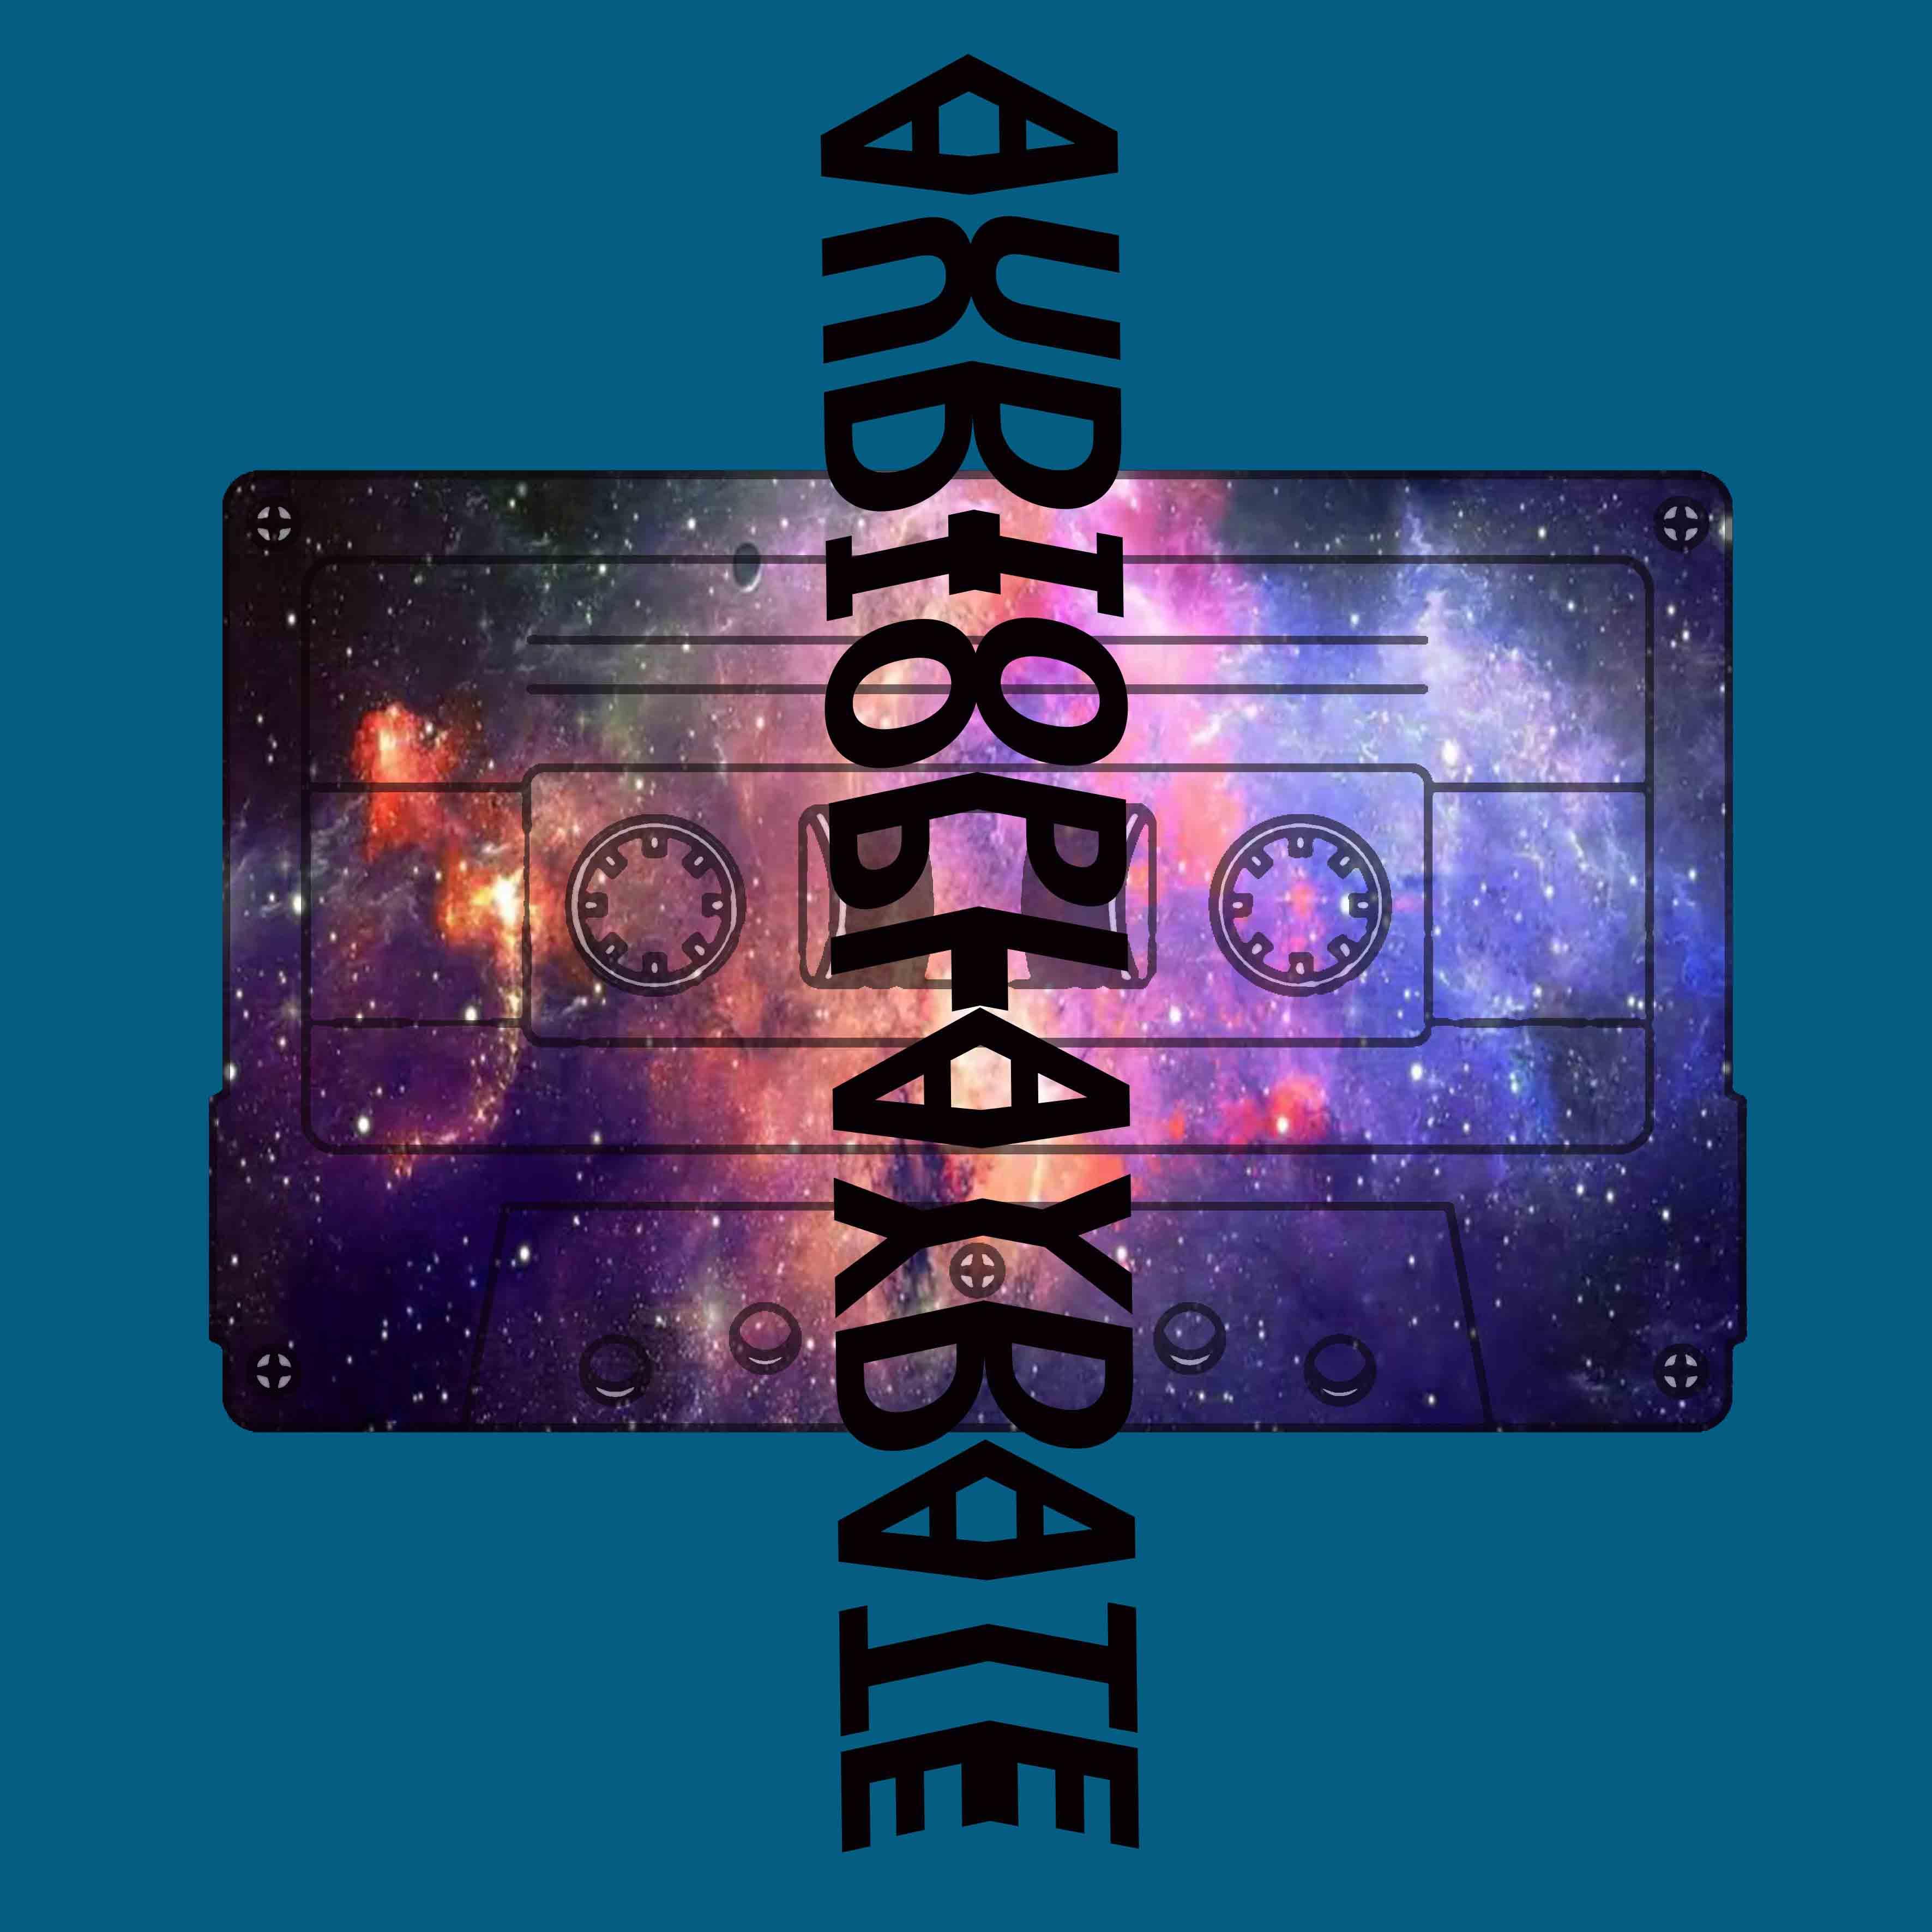 audioplaydateimage2